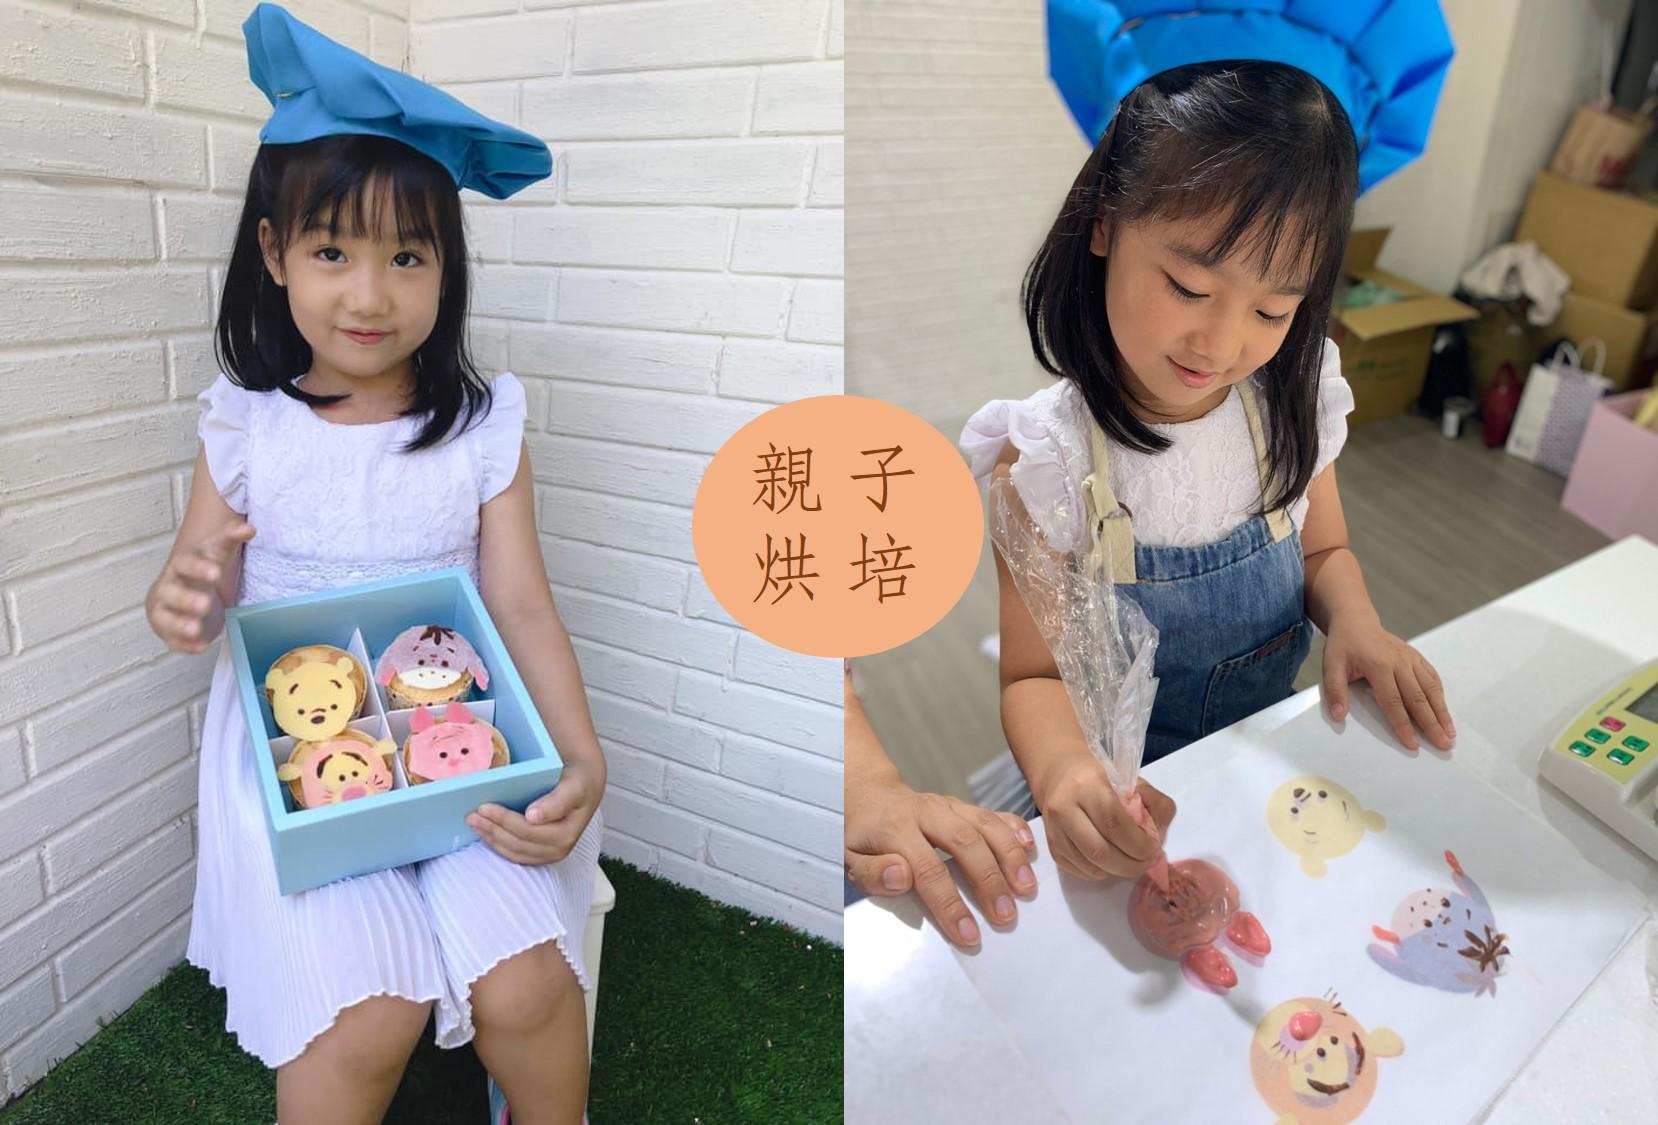 【Welcome Bake|台北親子做蛋糕 DIY】 小熊維尼杯子蛋糕  60 分鐘完成!